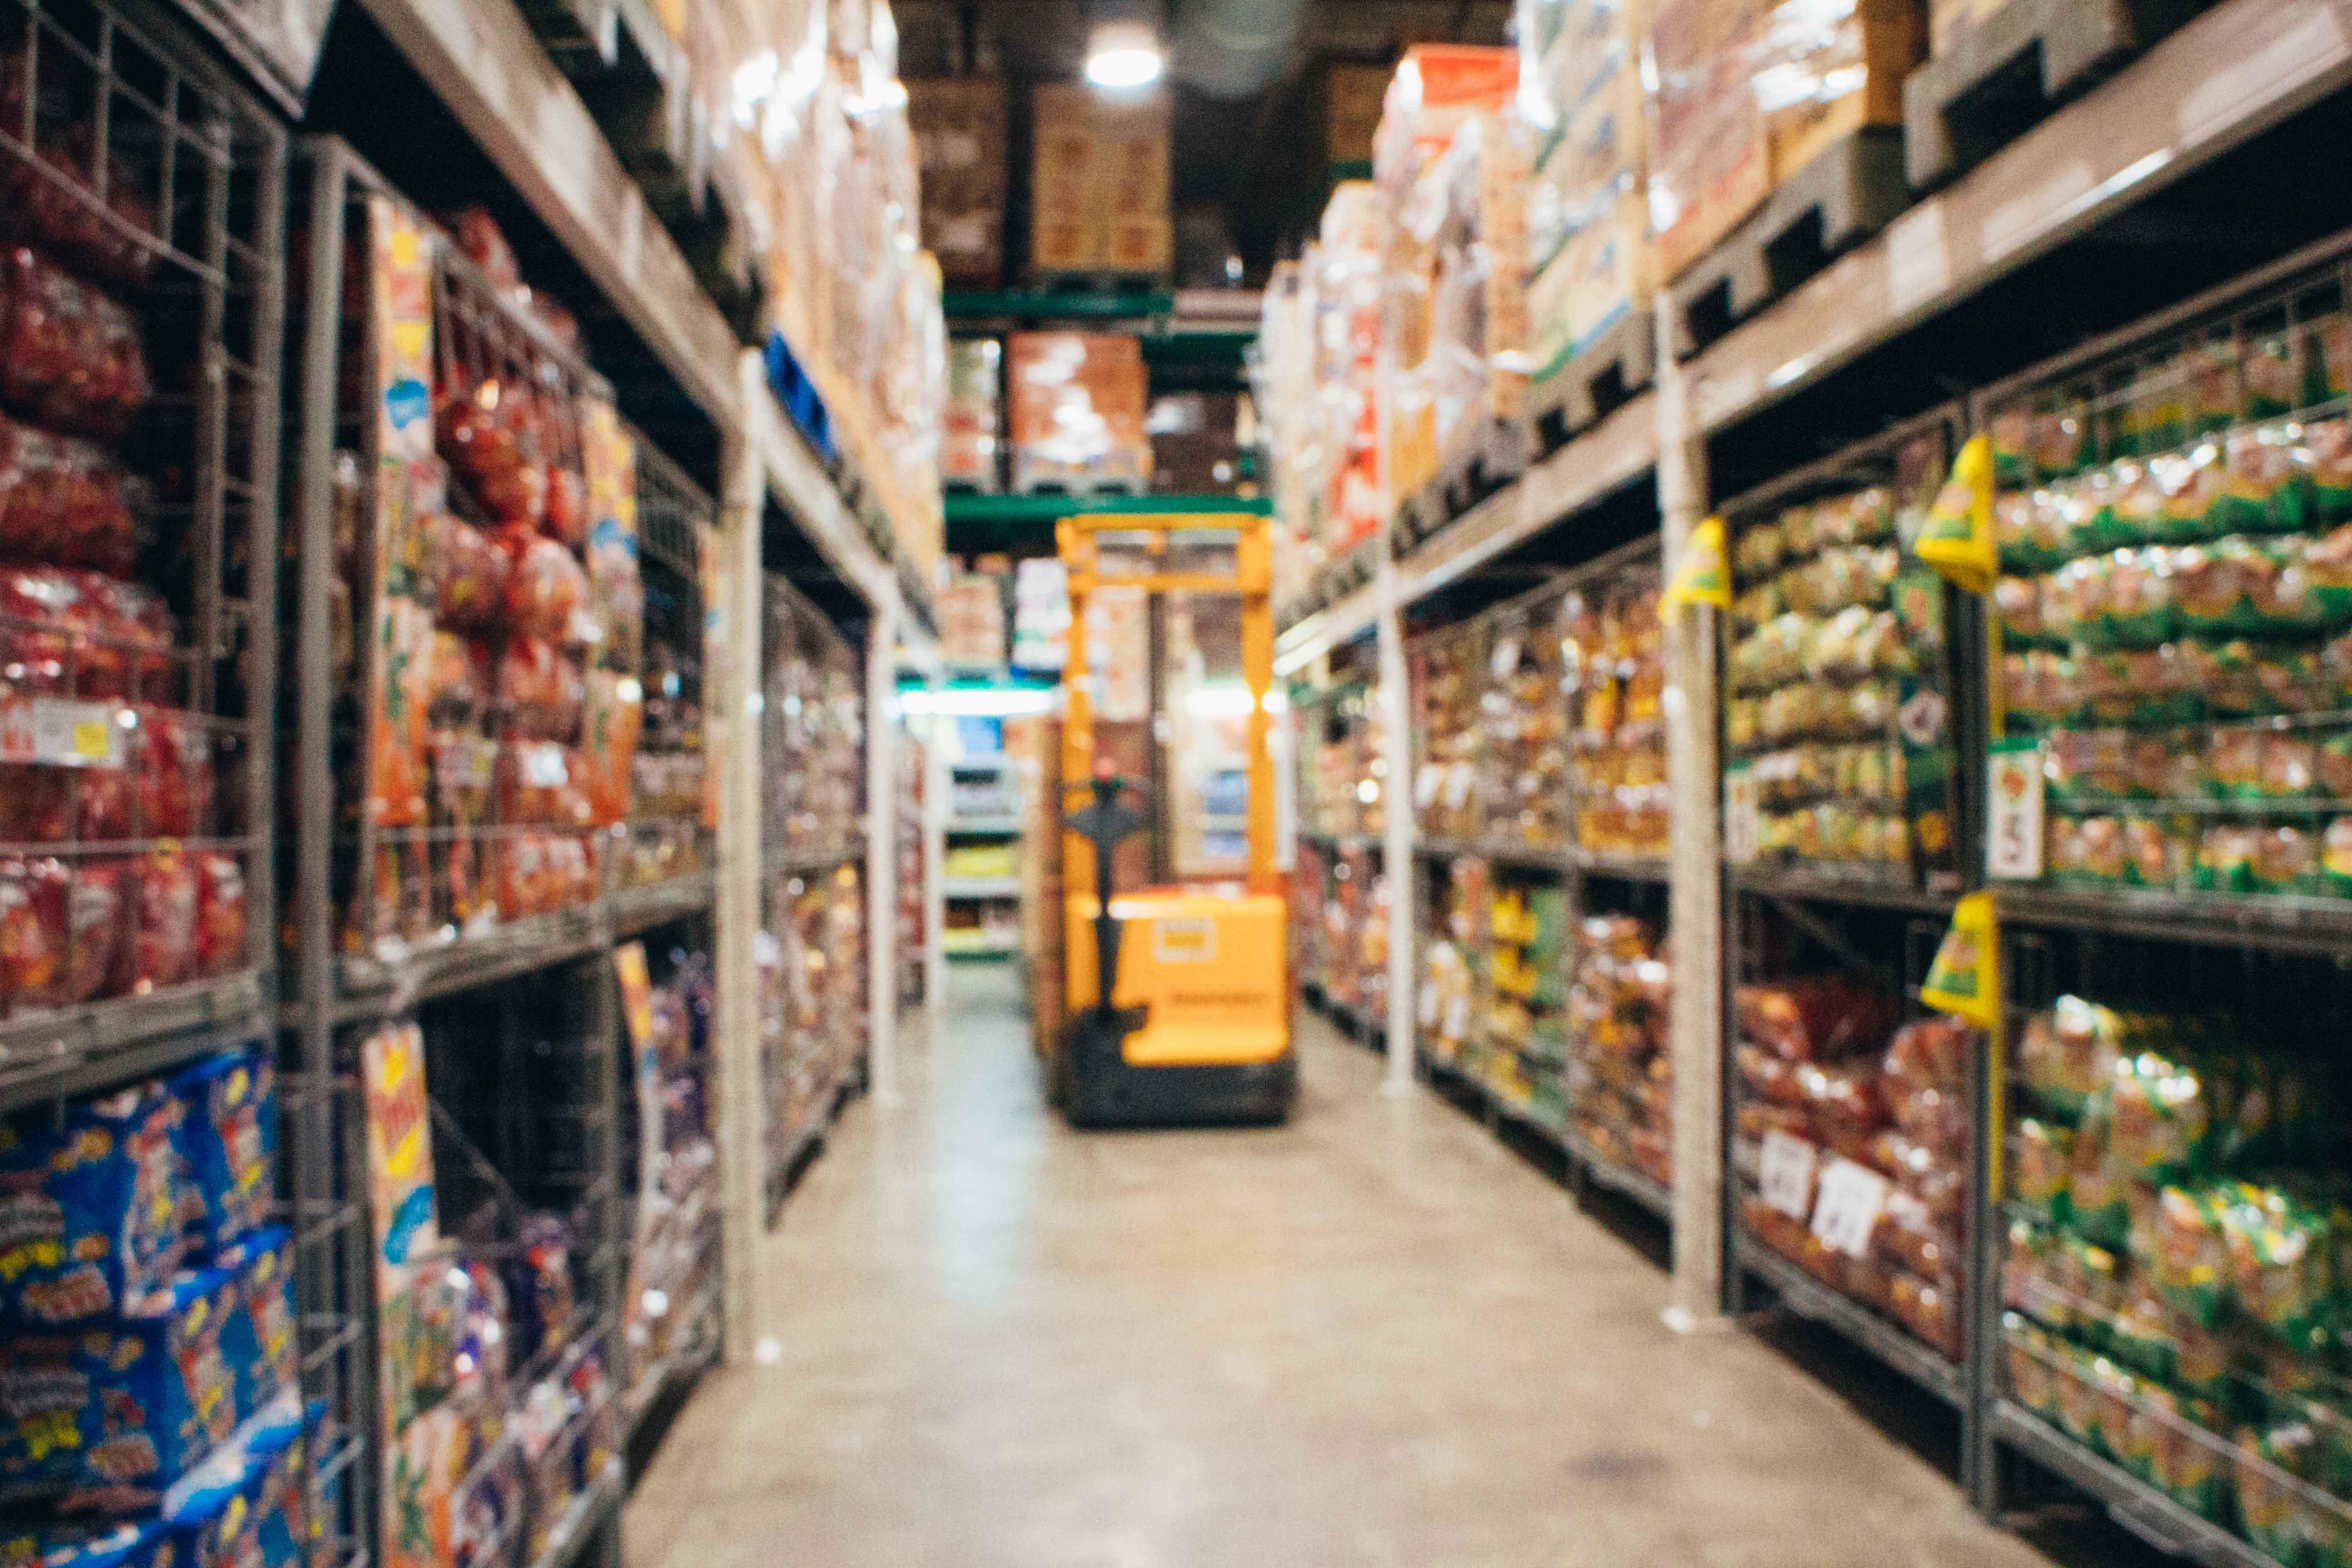 Imnagen de almacén de supermercado desenfocada